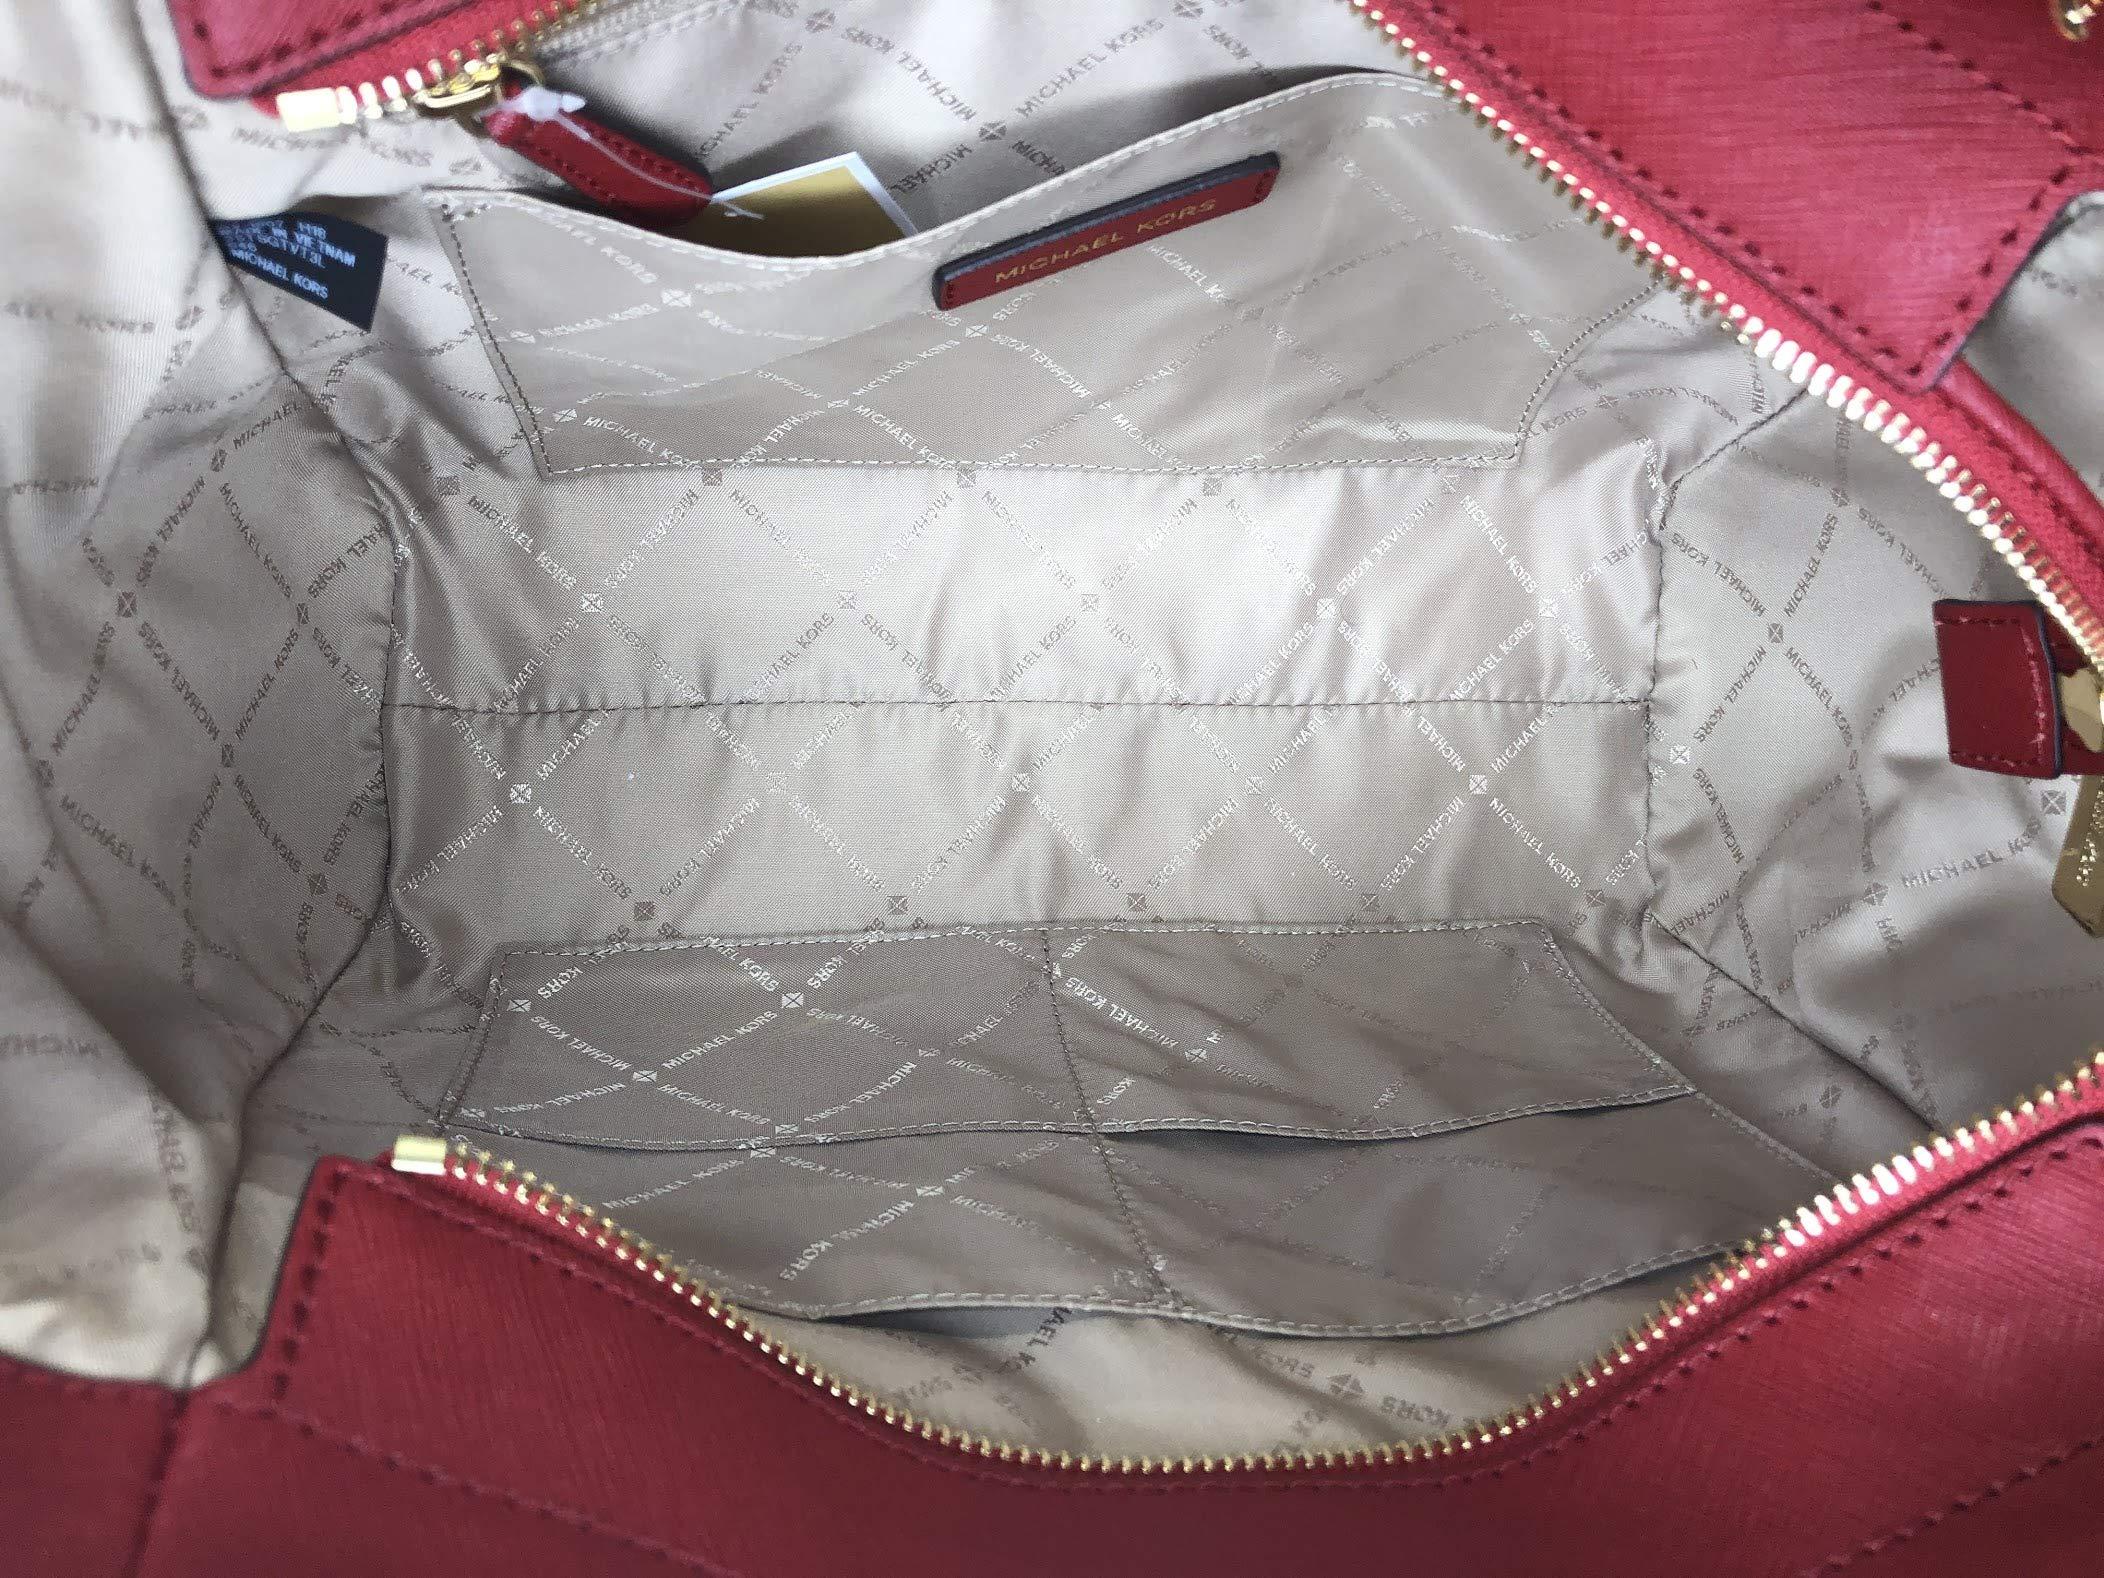 MICHAEL Michael Kors Jet Set Travel Large Chain Shoulder Tote bundled with Large Flat MF Phone Case Wallet Wristlet (Scarlet) by Michael Kors (Image #6)